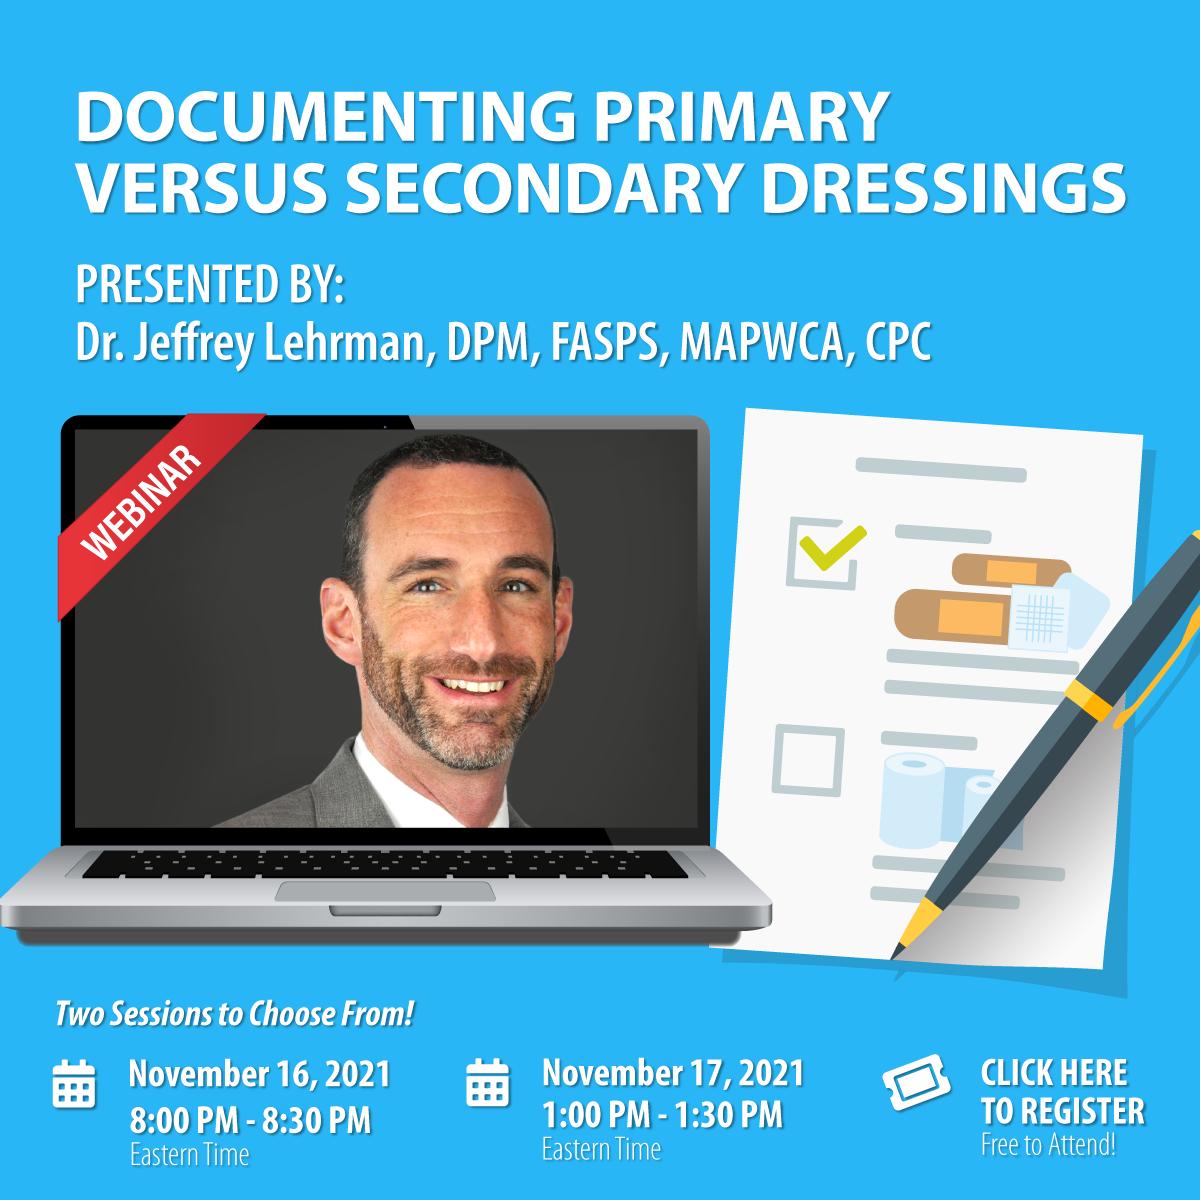 Webinar: Documenting Primary Versus Secondary Dressings